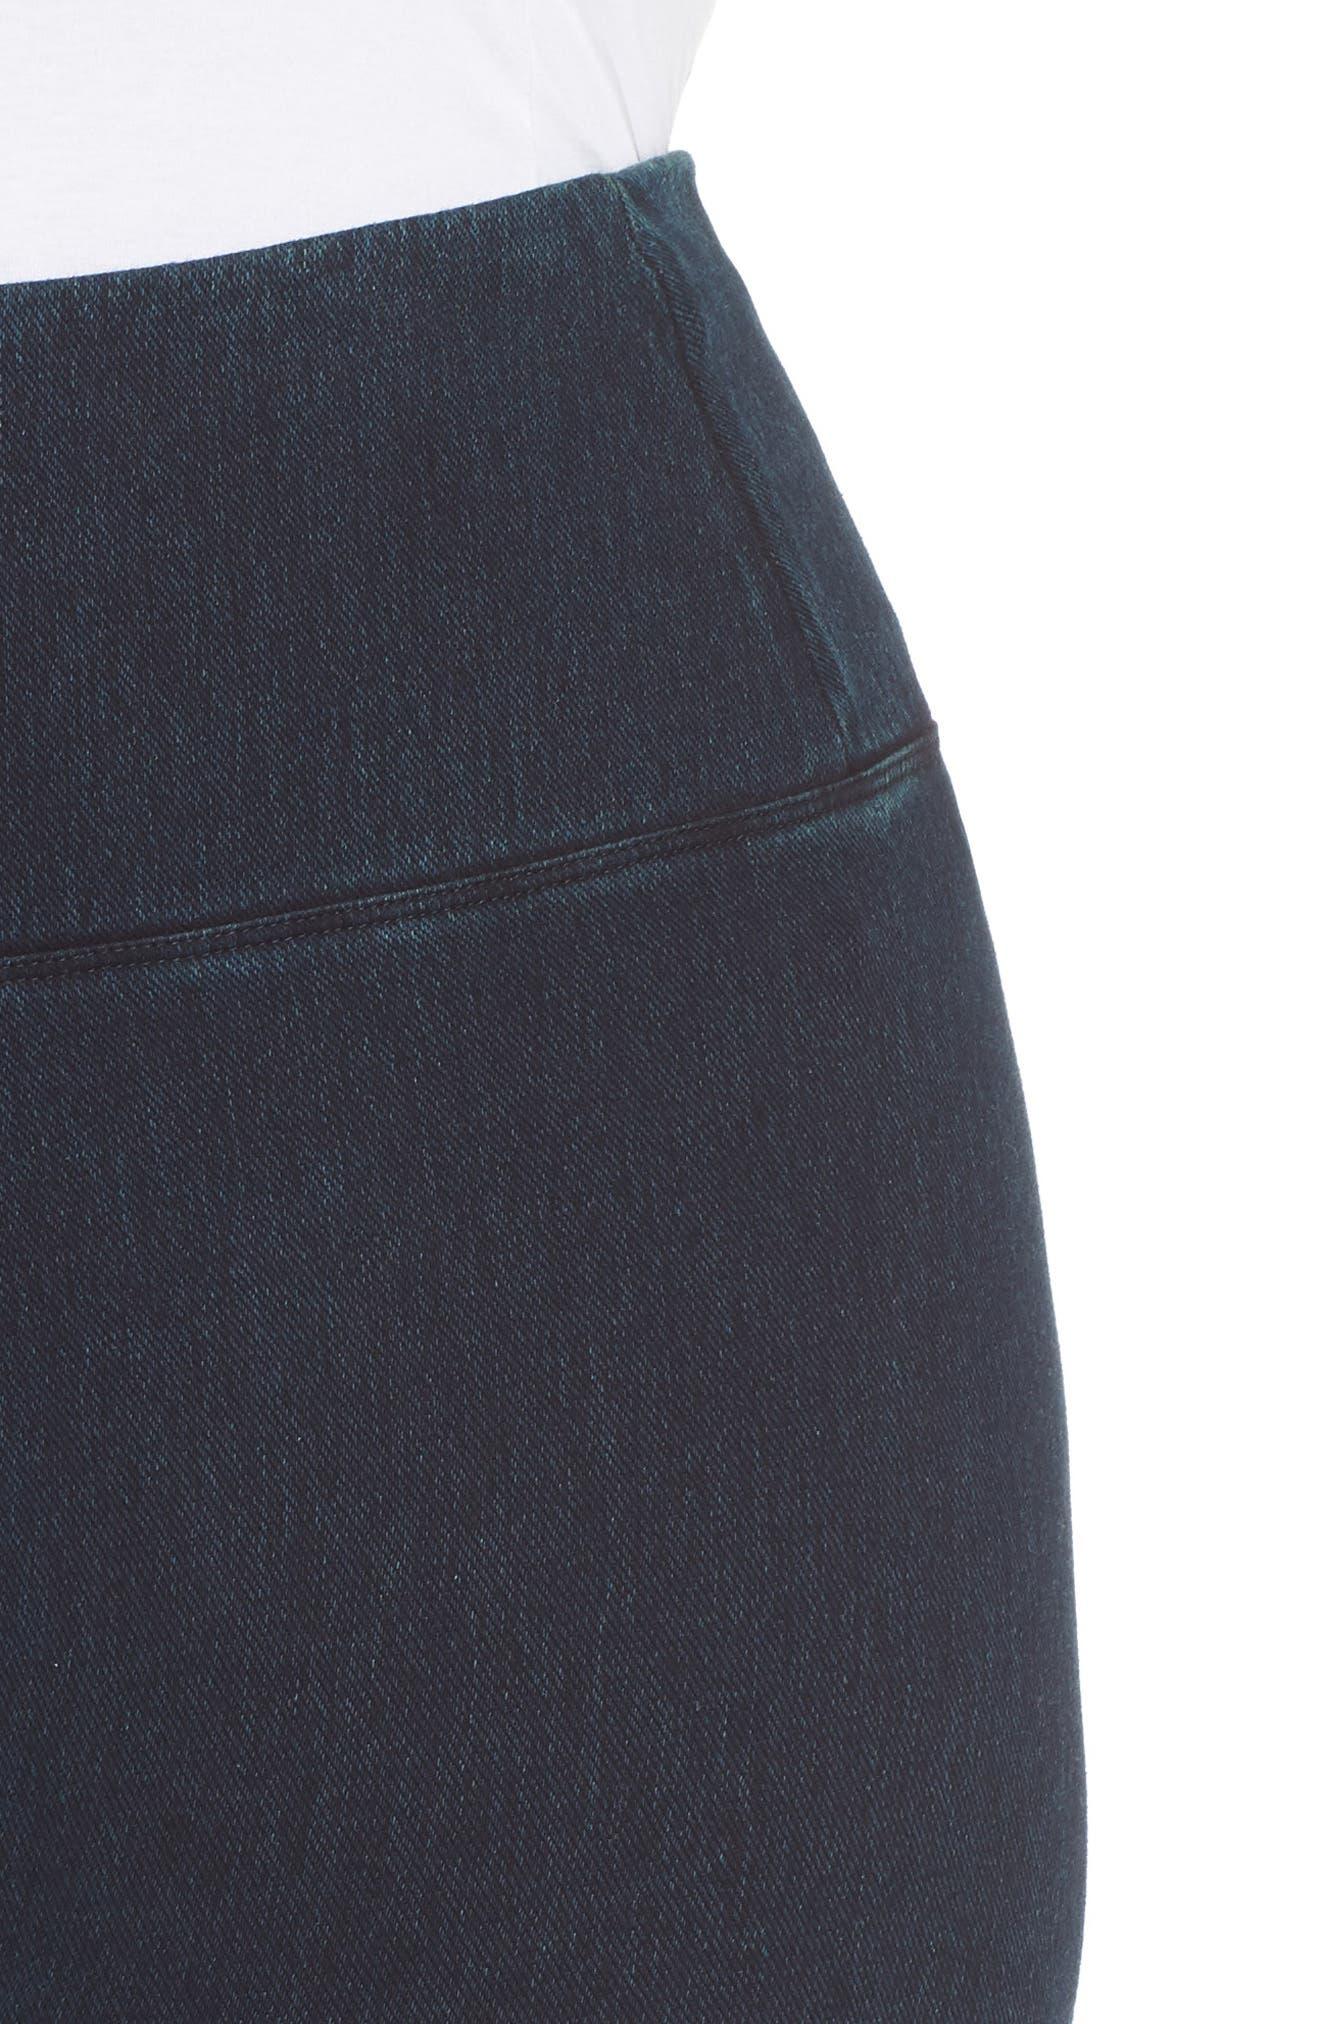 High Rise Stretch Denim Leggings,                             Alternate thumbnail 4, color,                             INDIGO